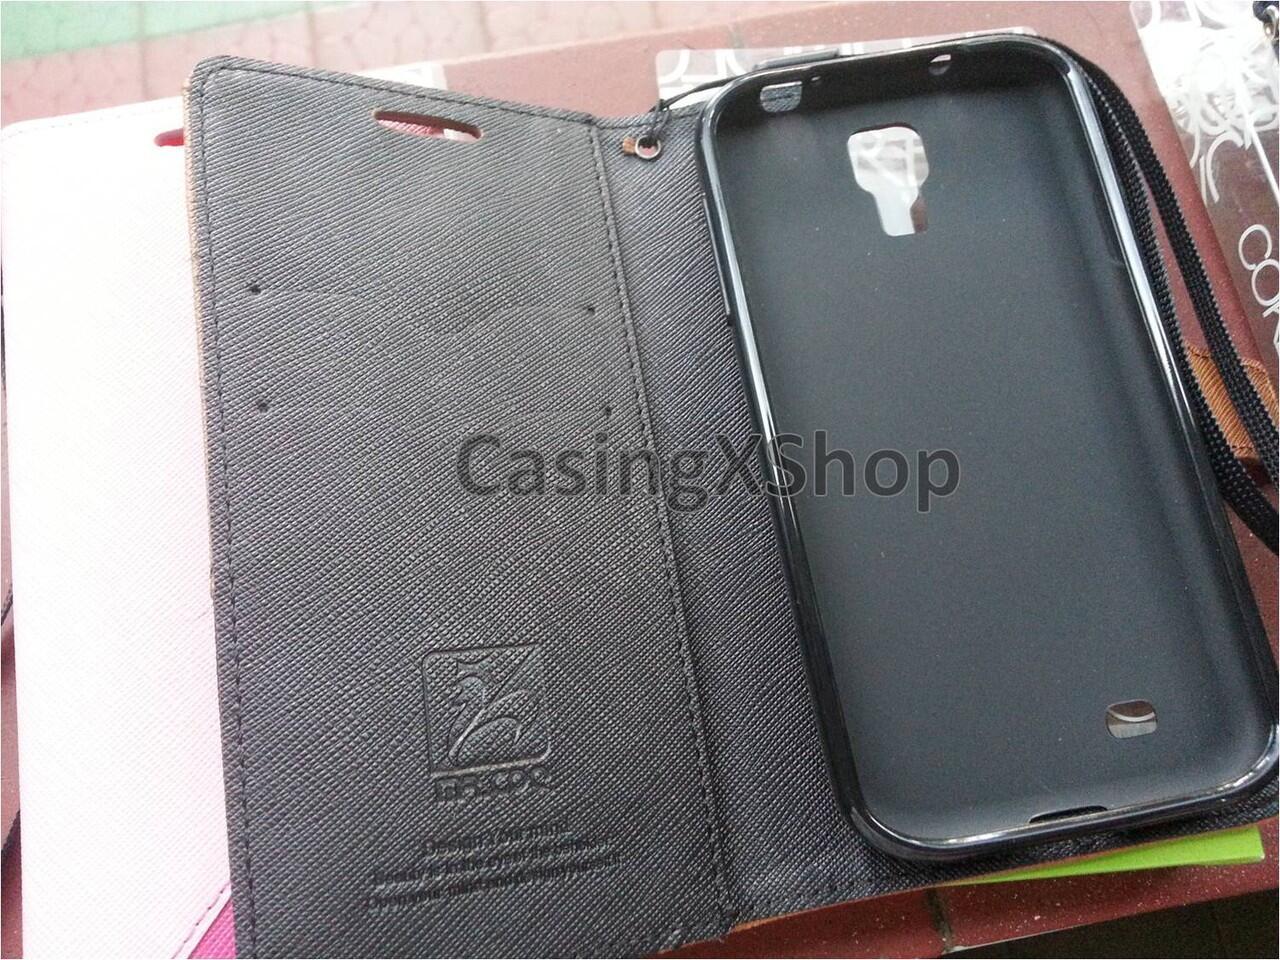 [MR QOO] Fashion Bookcase for Samsung Galaxy S4, Iphone 5